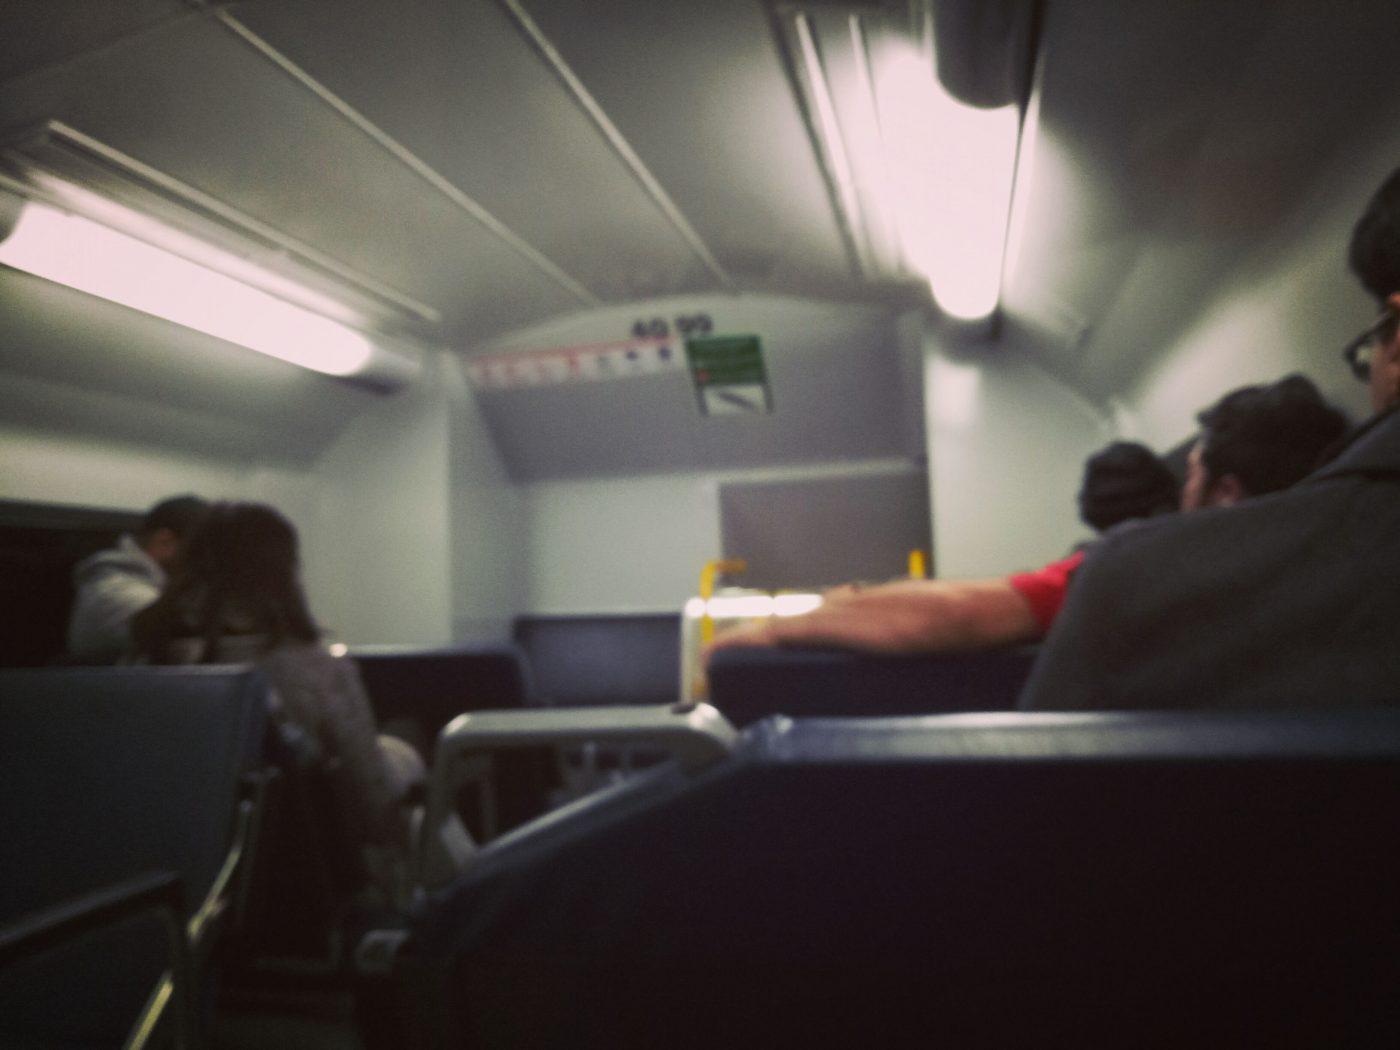 Sydney Train Carriage Passengers